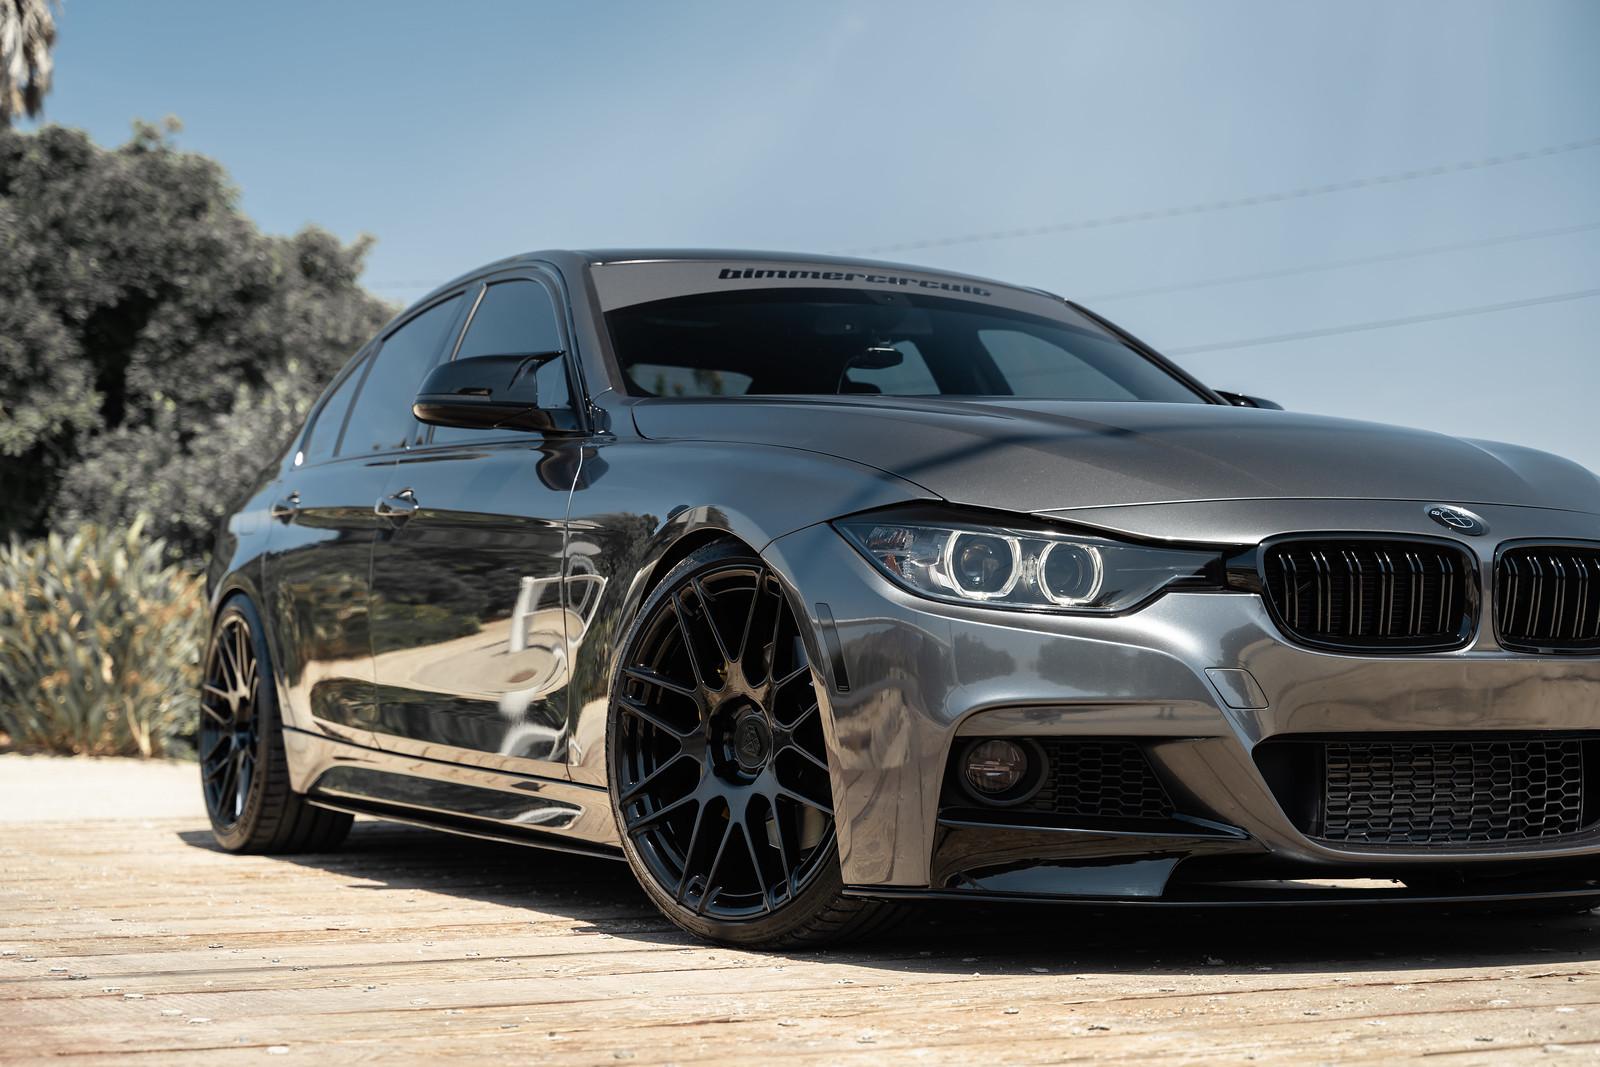 2015_BMW_335i_BDF12_Custom_Finish_Gloss_Black_2